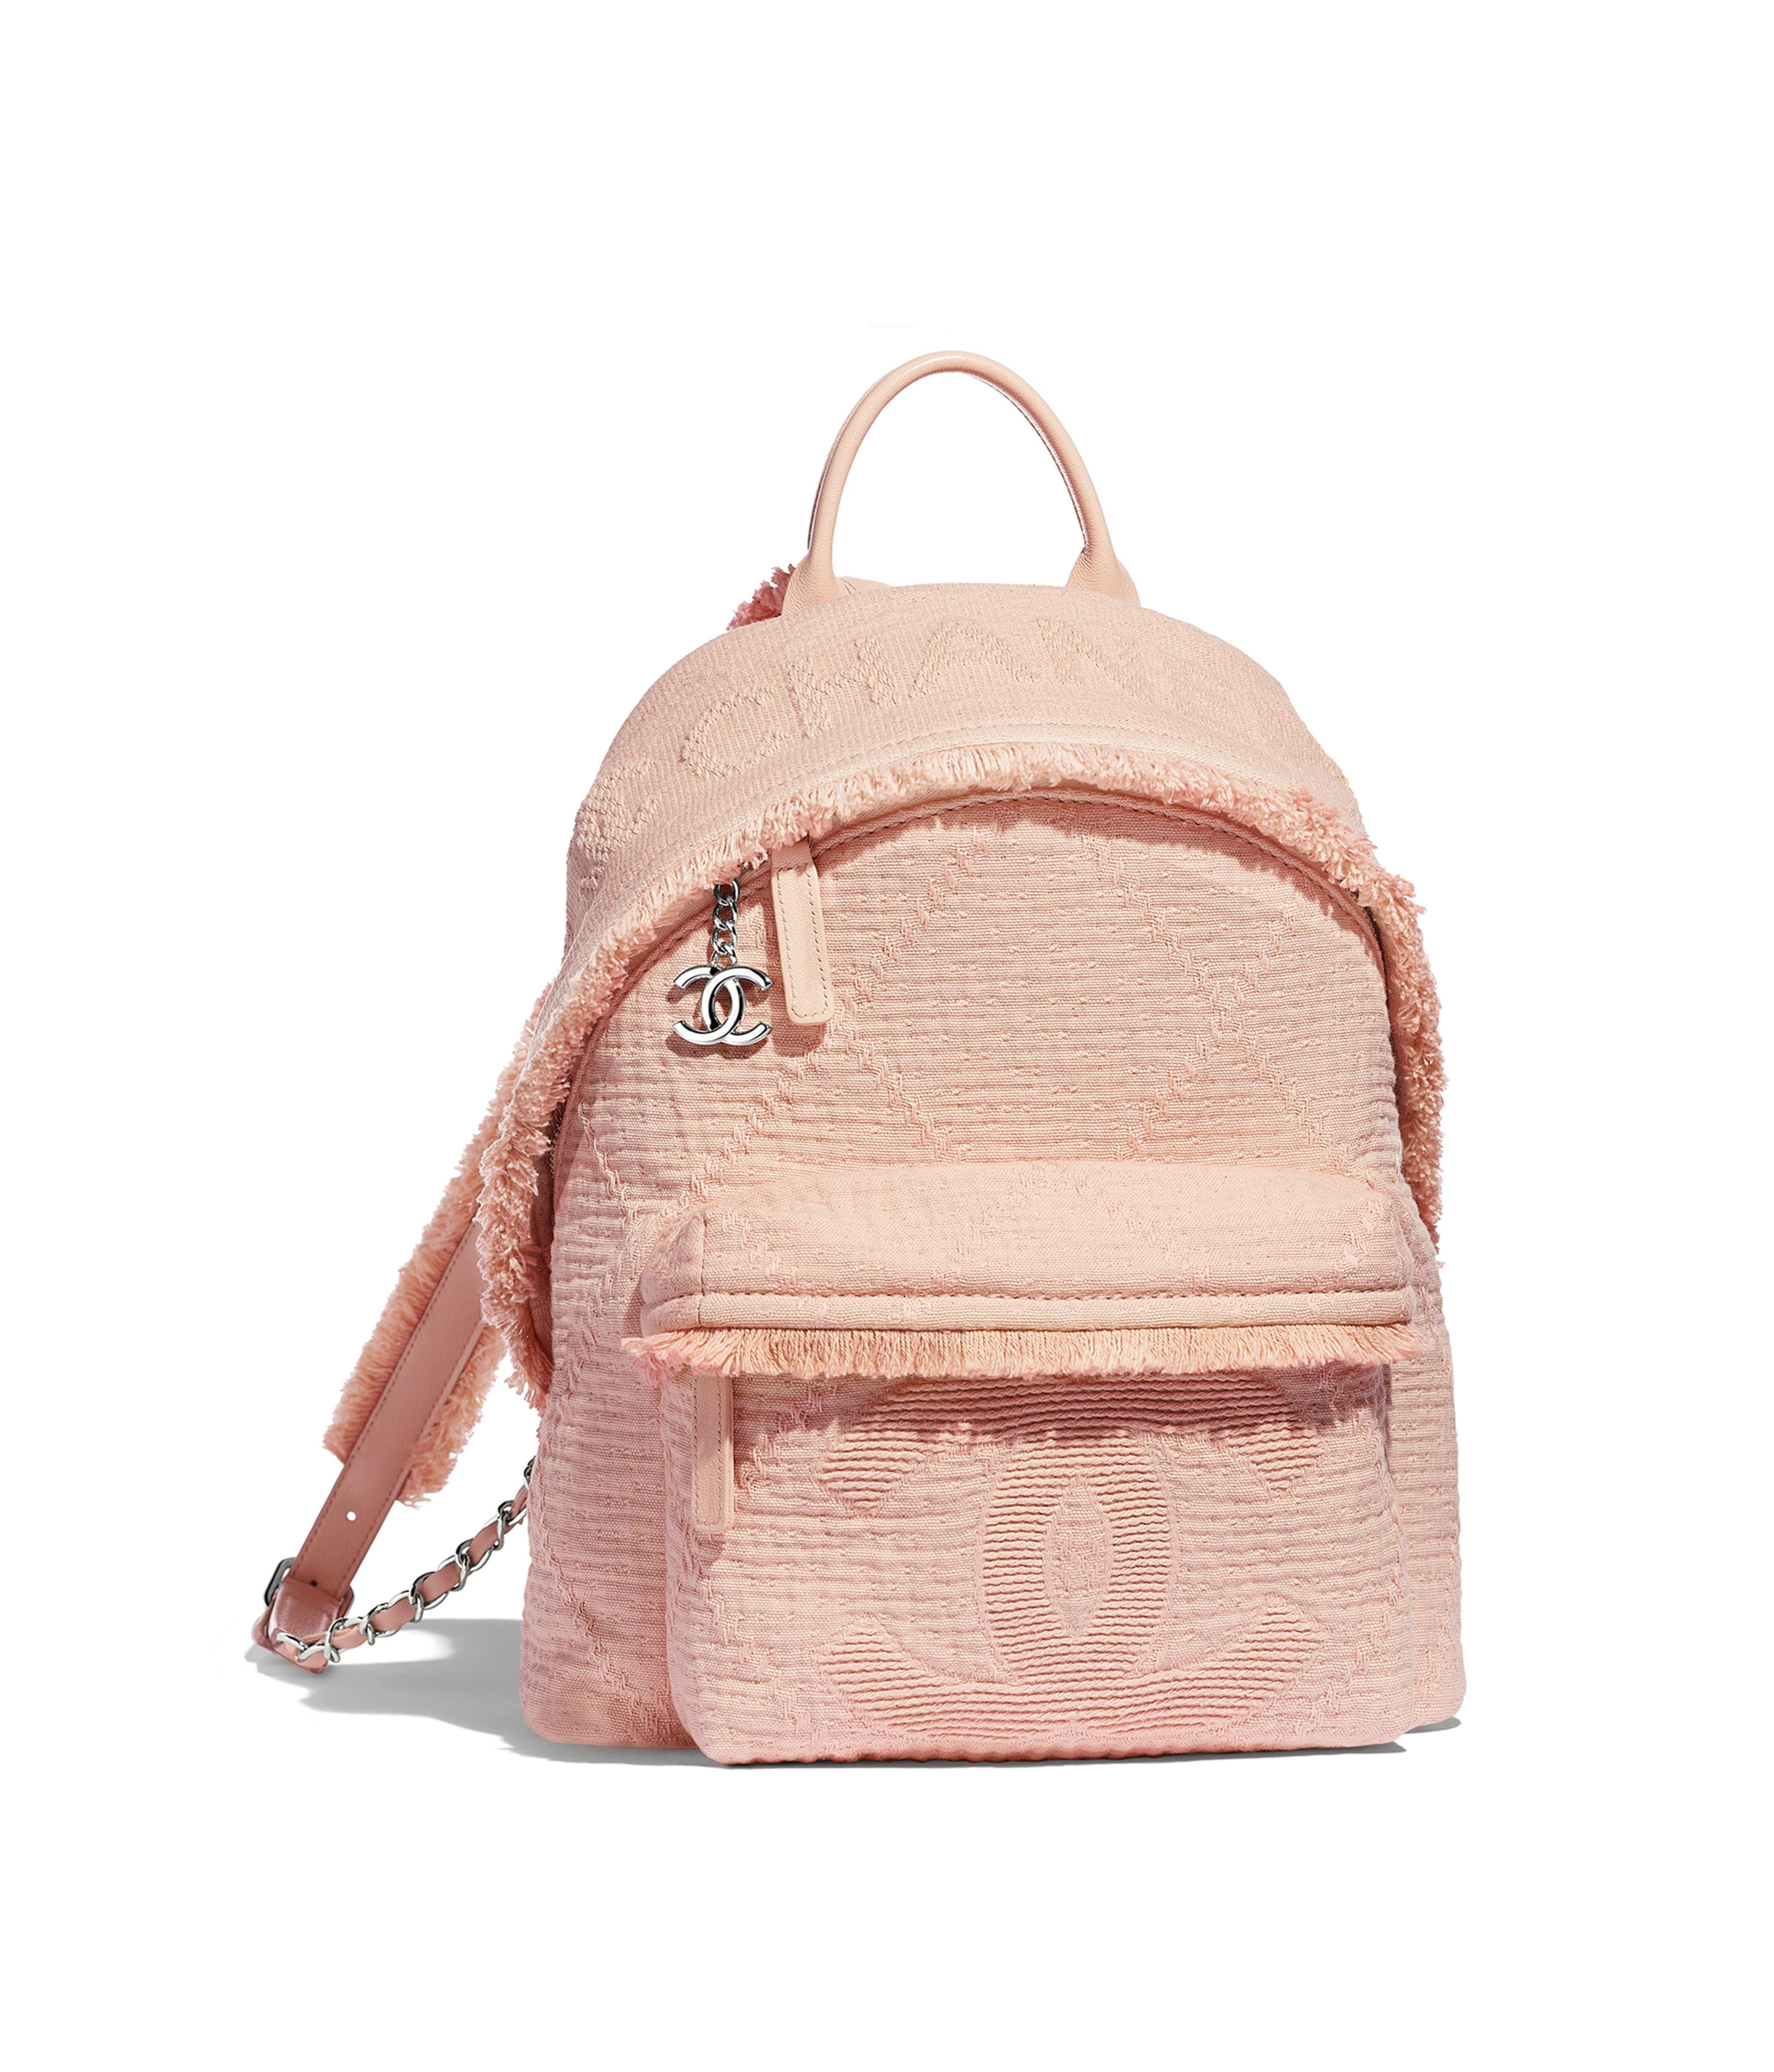 73f7bd254 Backpack Mixed Fibers, Goatskin, Silver-Tone Metal, Light Pink Ref.  AS0313B00107N0519